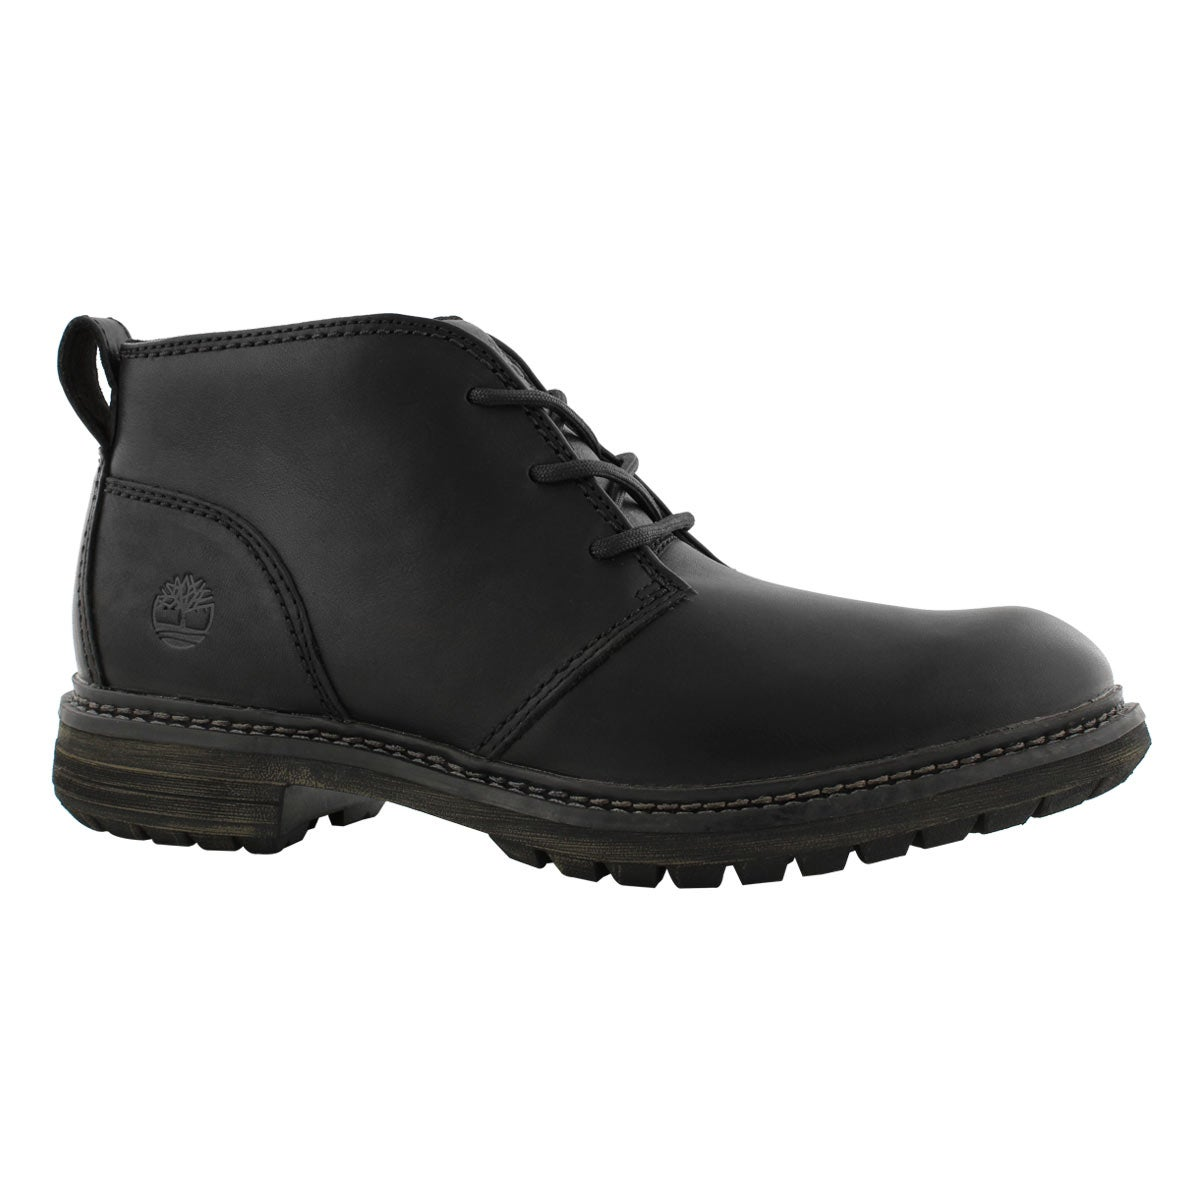 Mns Logan Bay black chukka boot